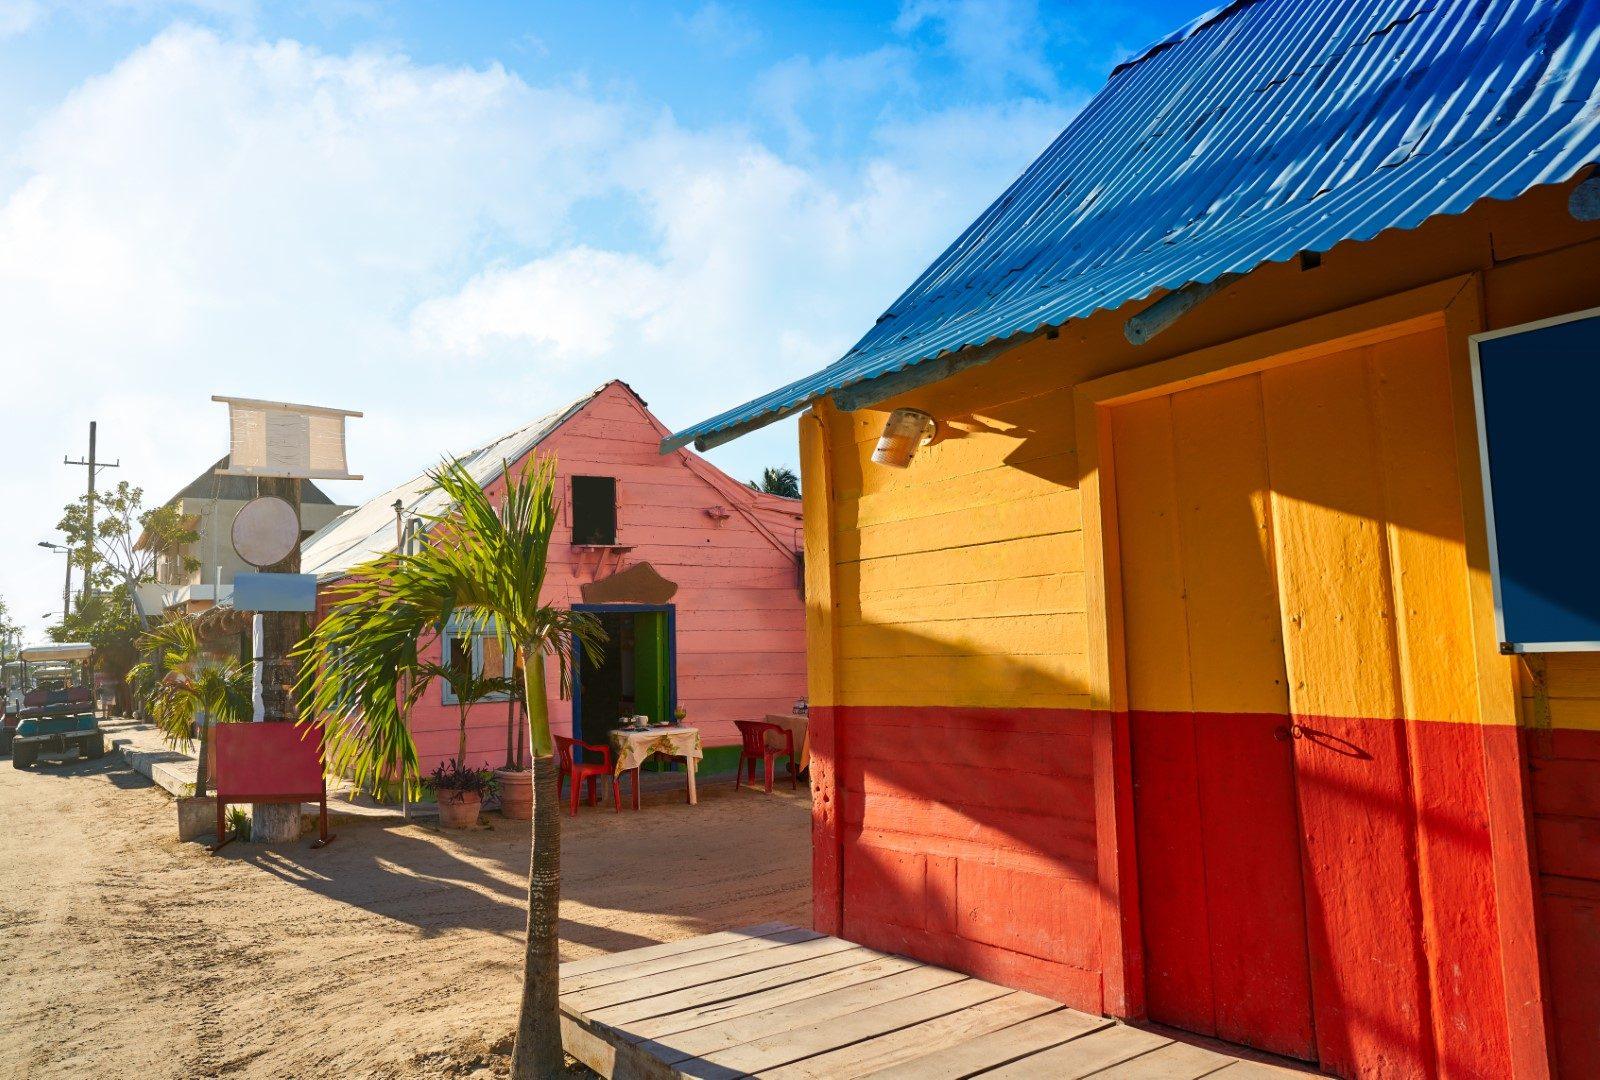 Street scene in Holbox, Mexico